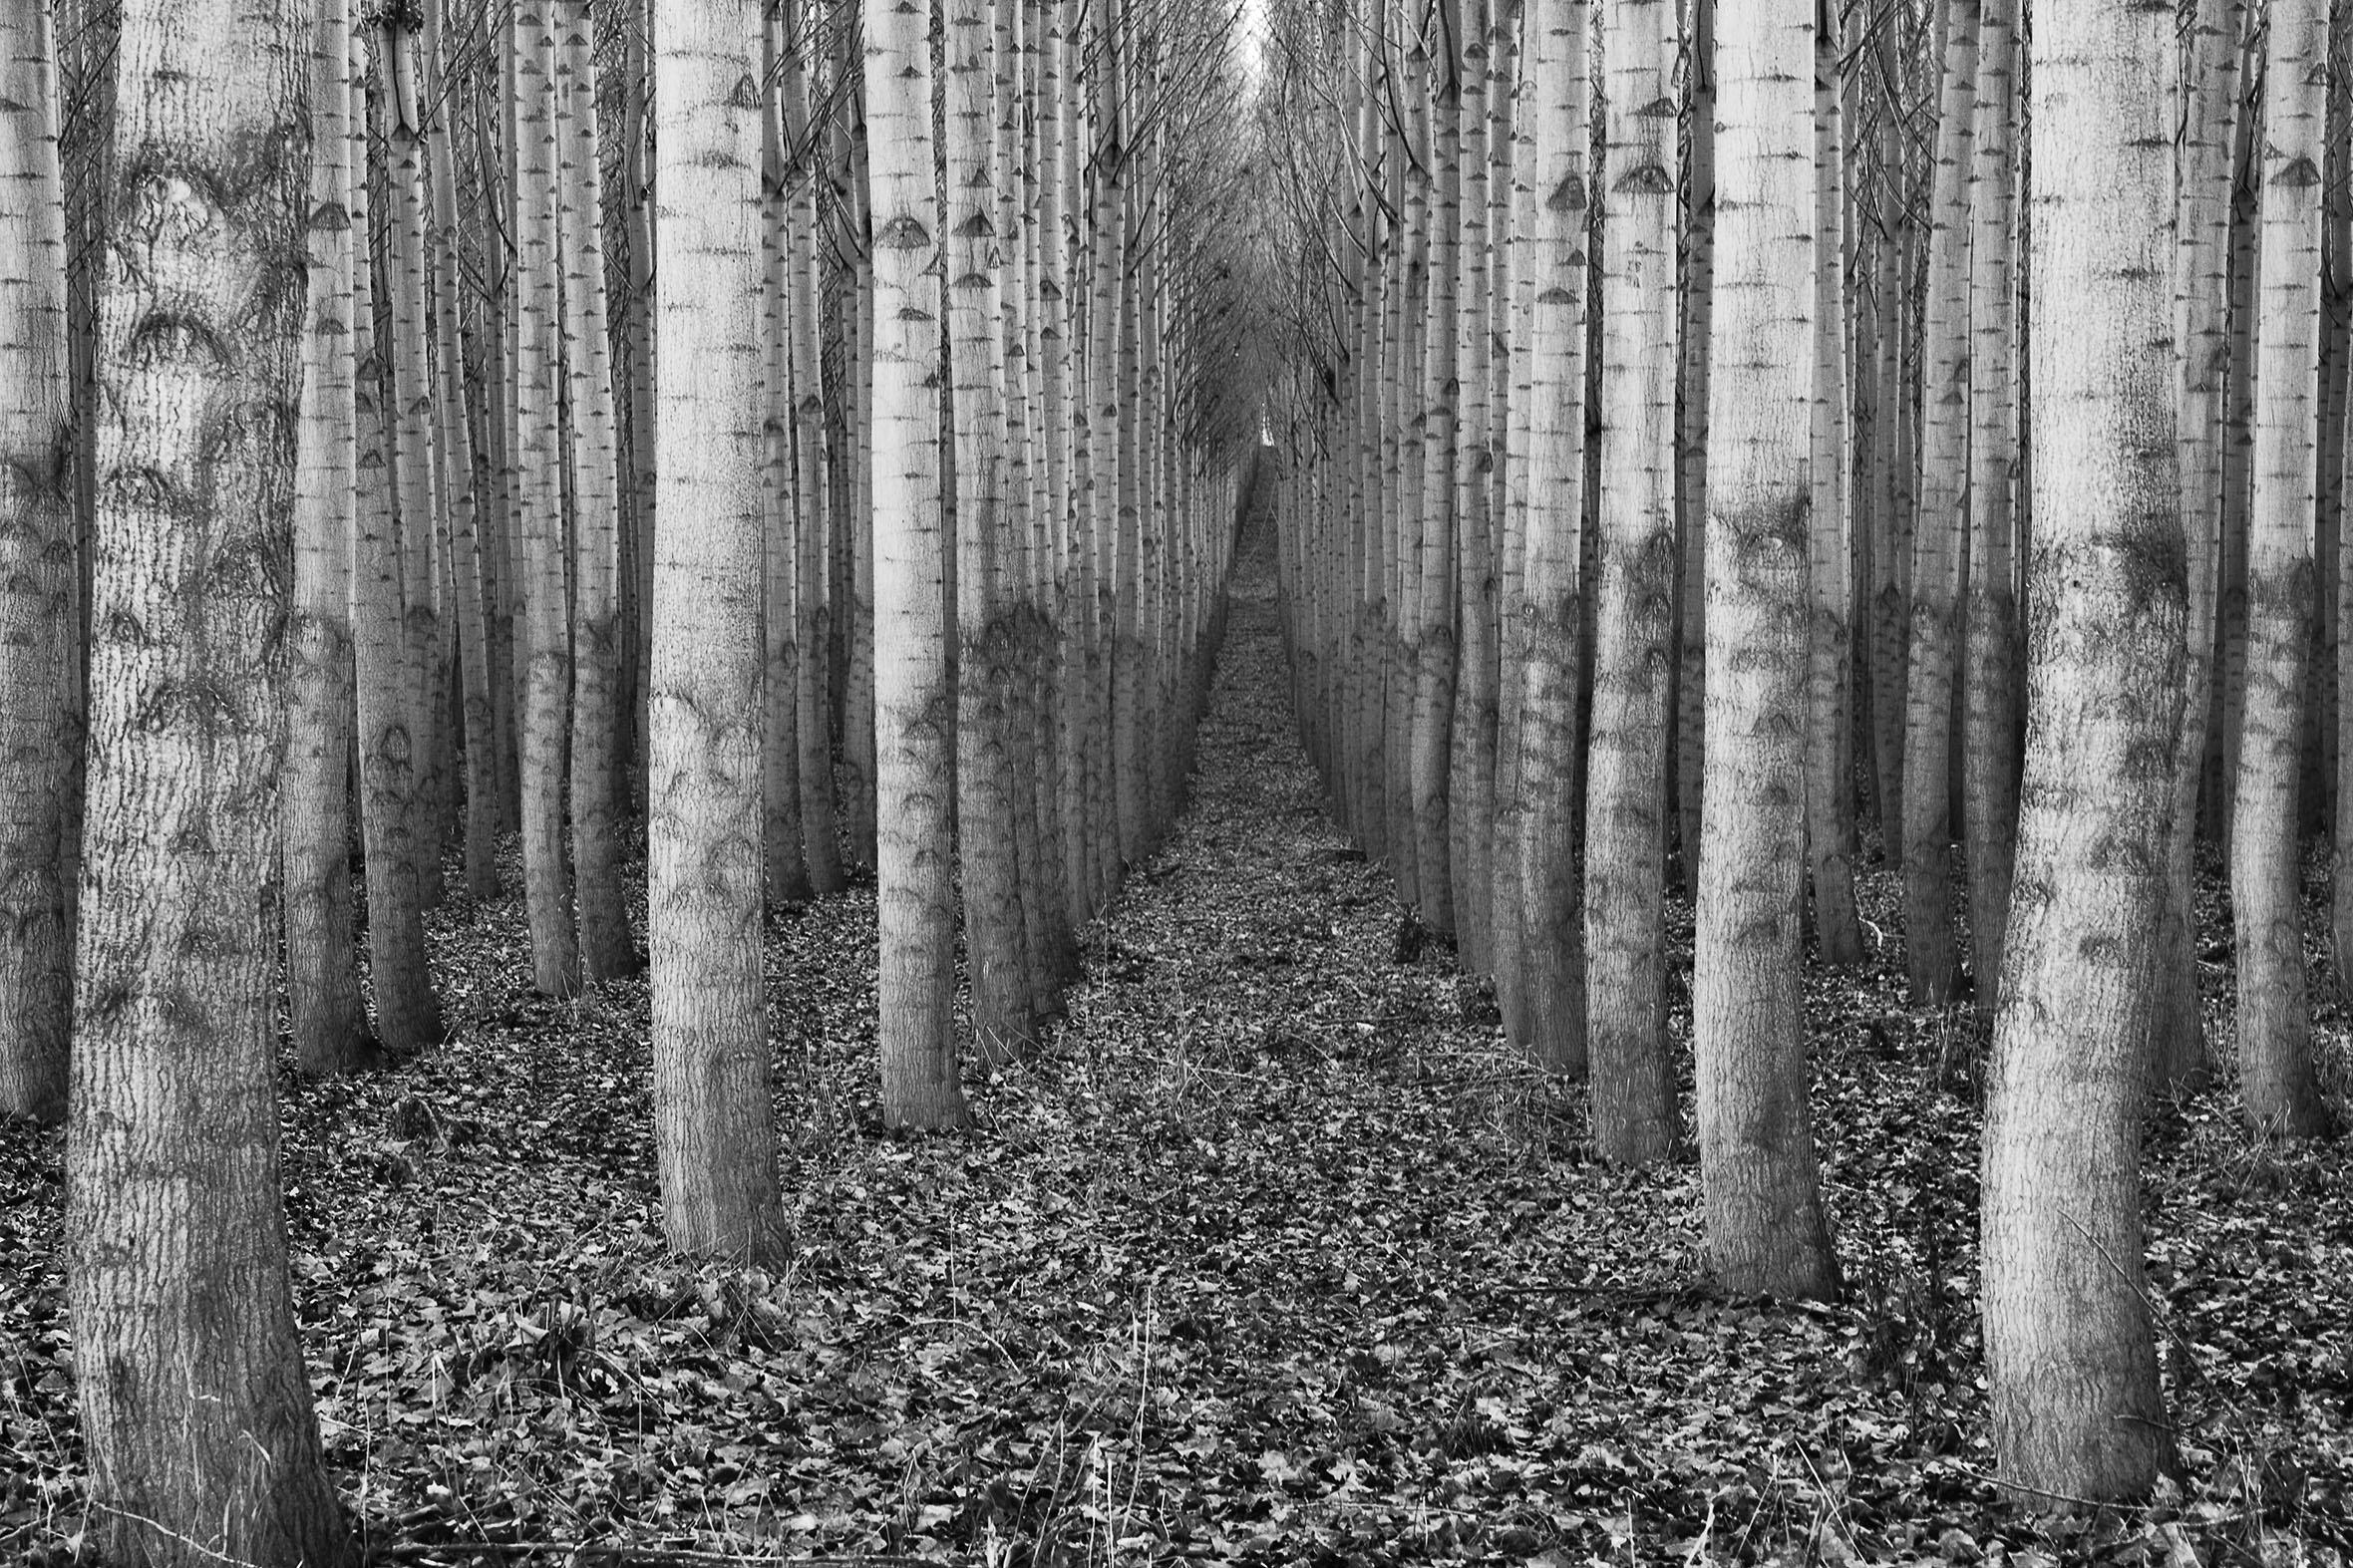 496 - Blackwood - Frisch